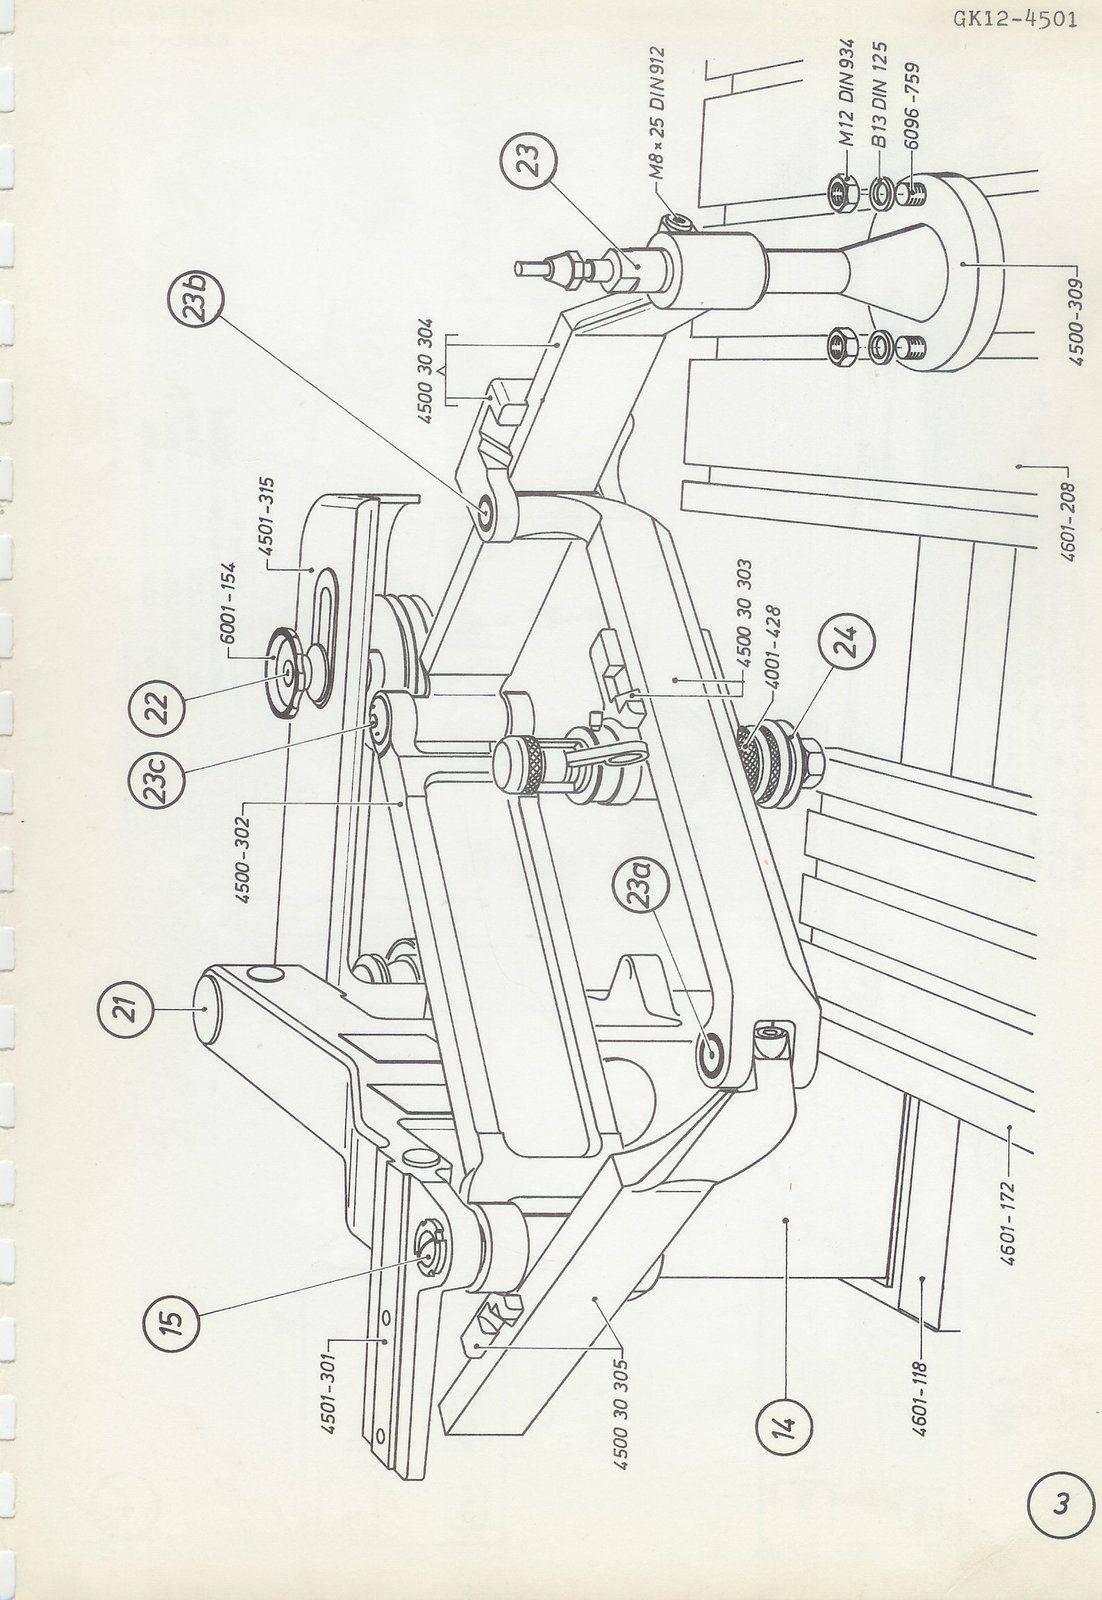 Deckel GK12-21 Parts Catalogue 1975 p3.jpg